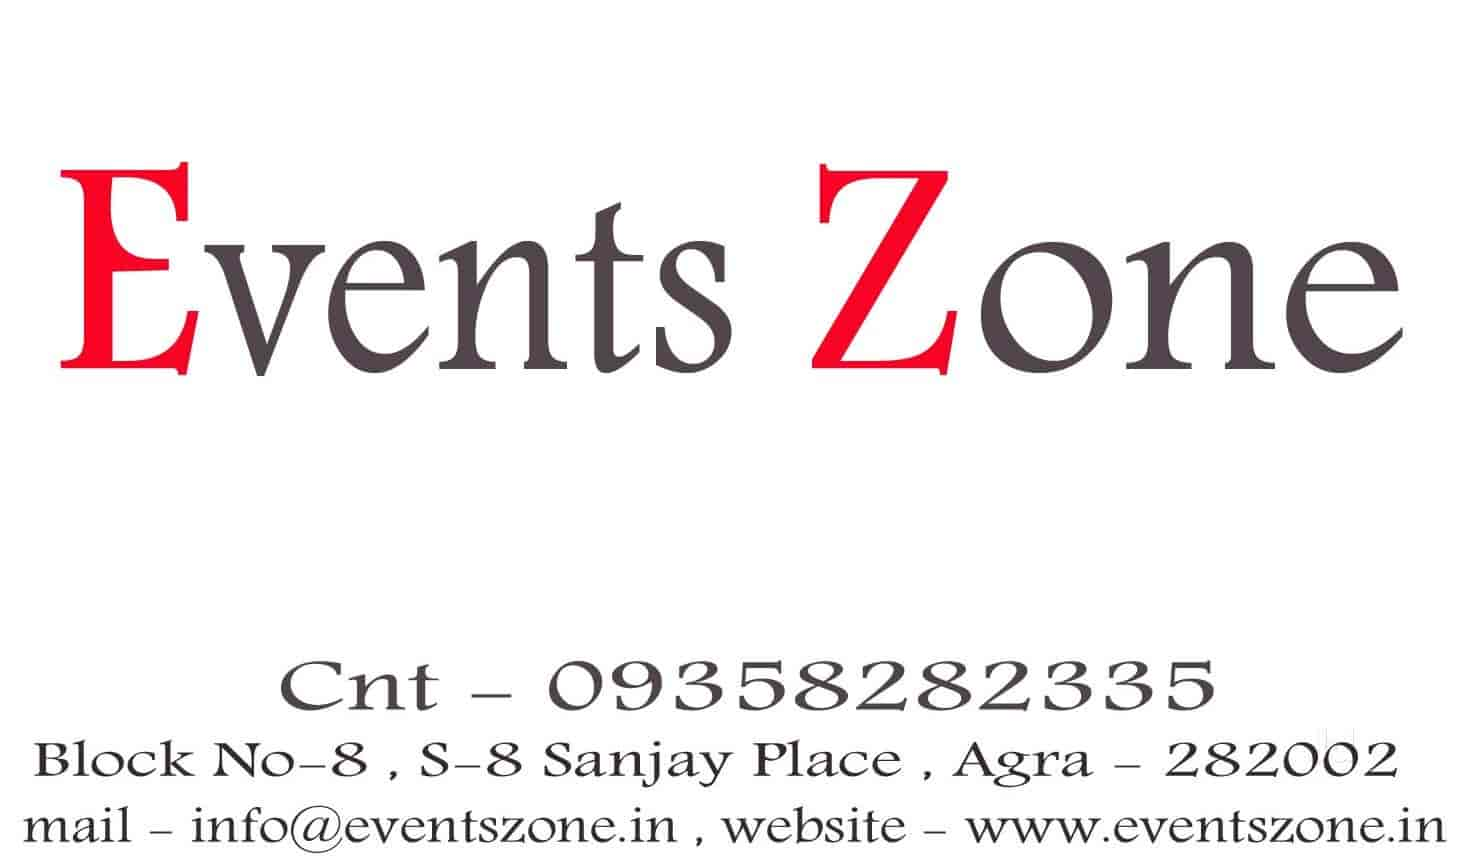 Events Zone Photos, Avas Vikash Colony, Agra- Pictures